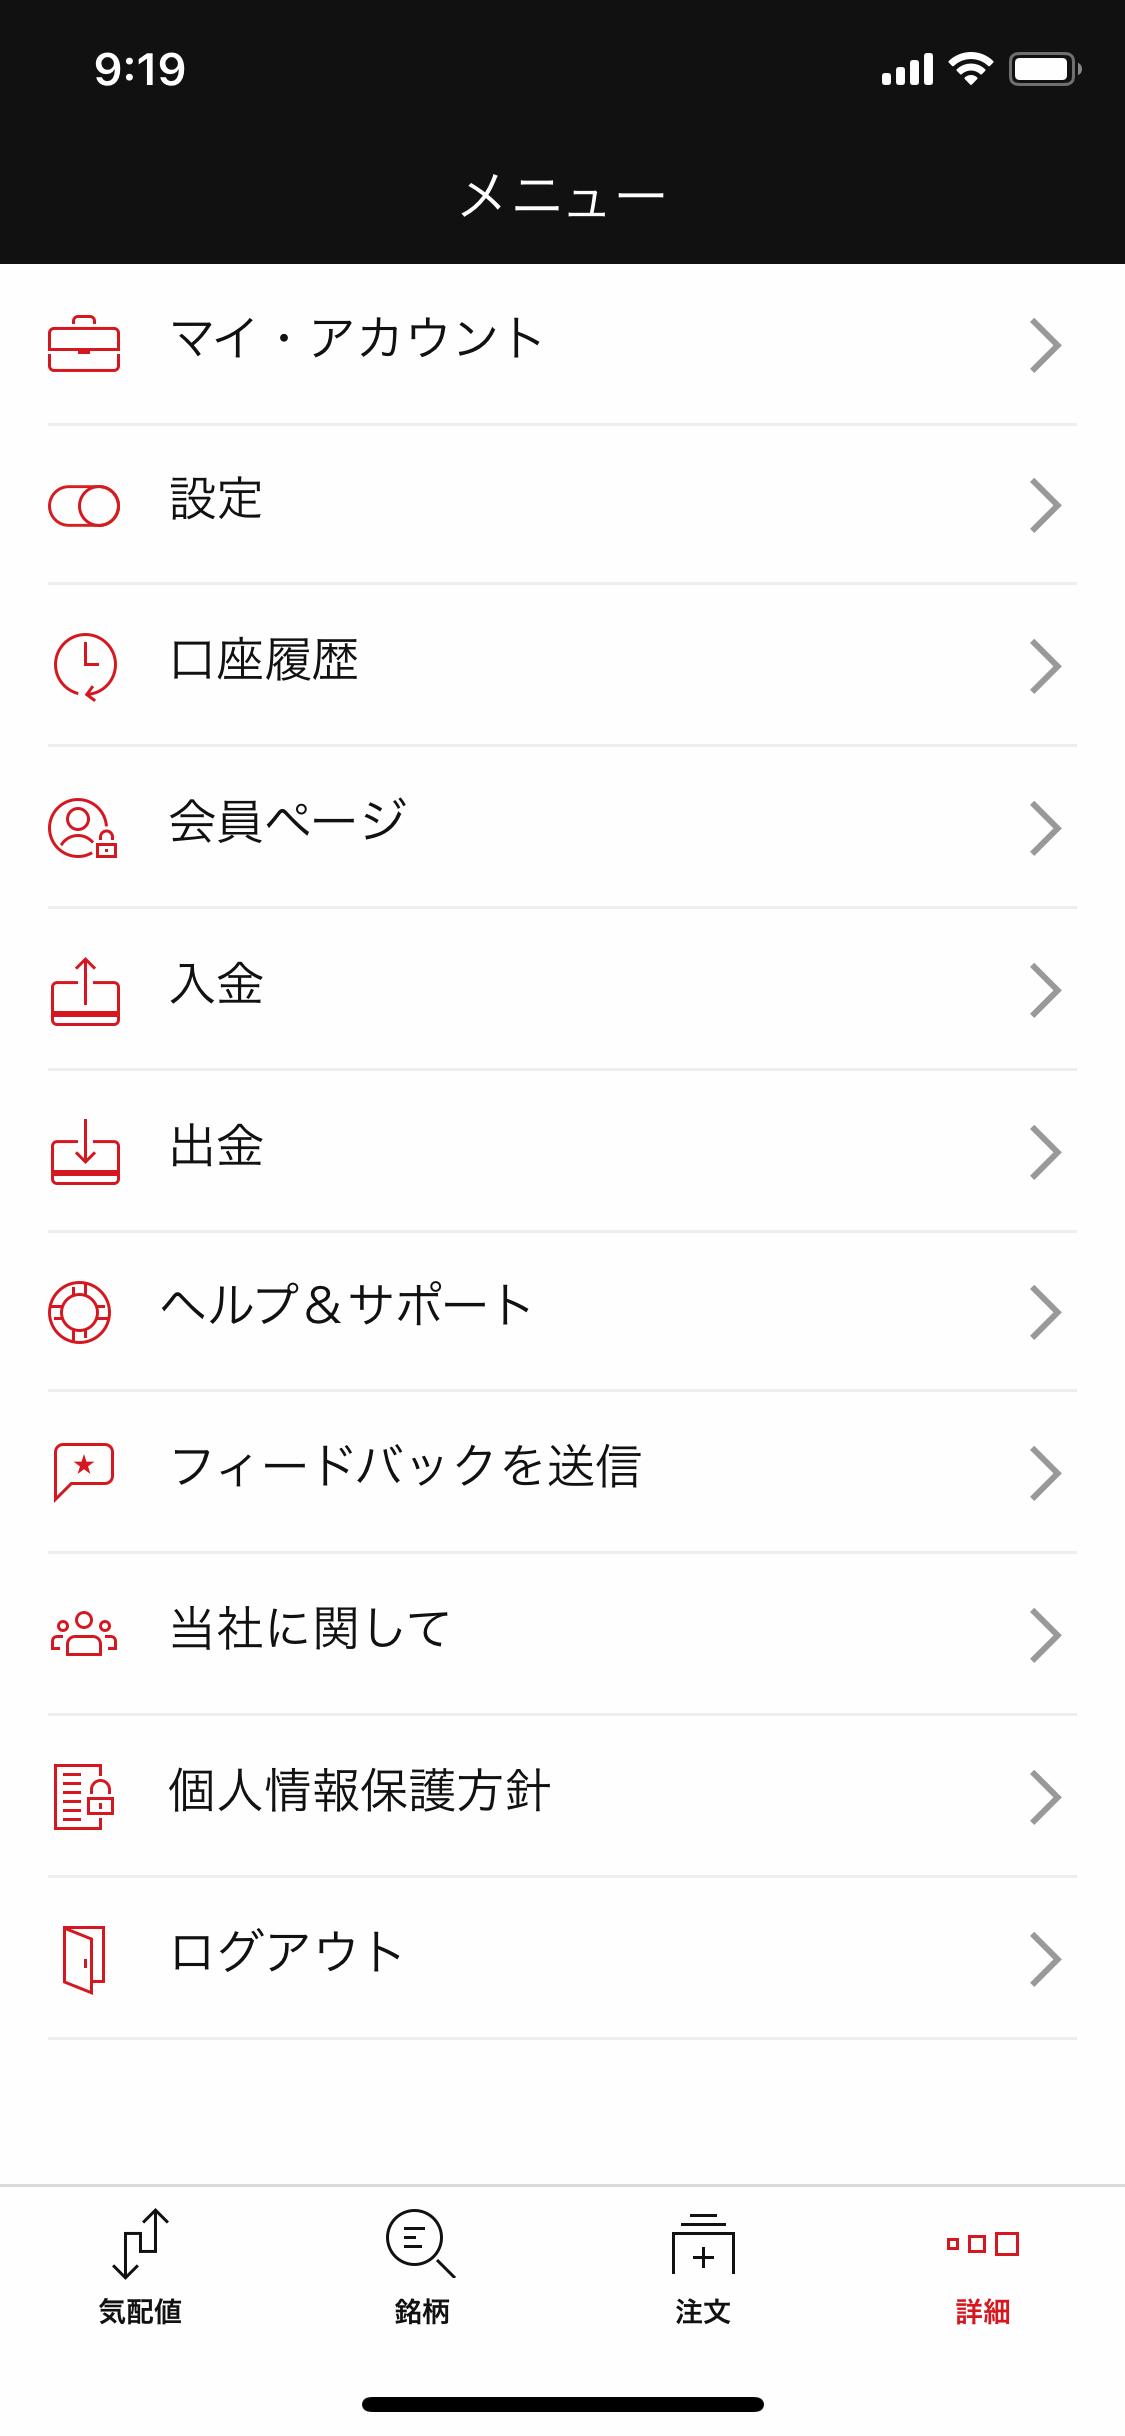 XMアプリ詳細画面